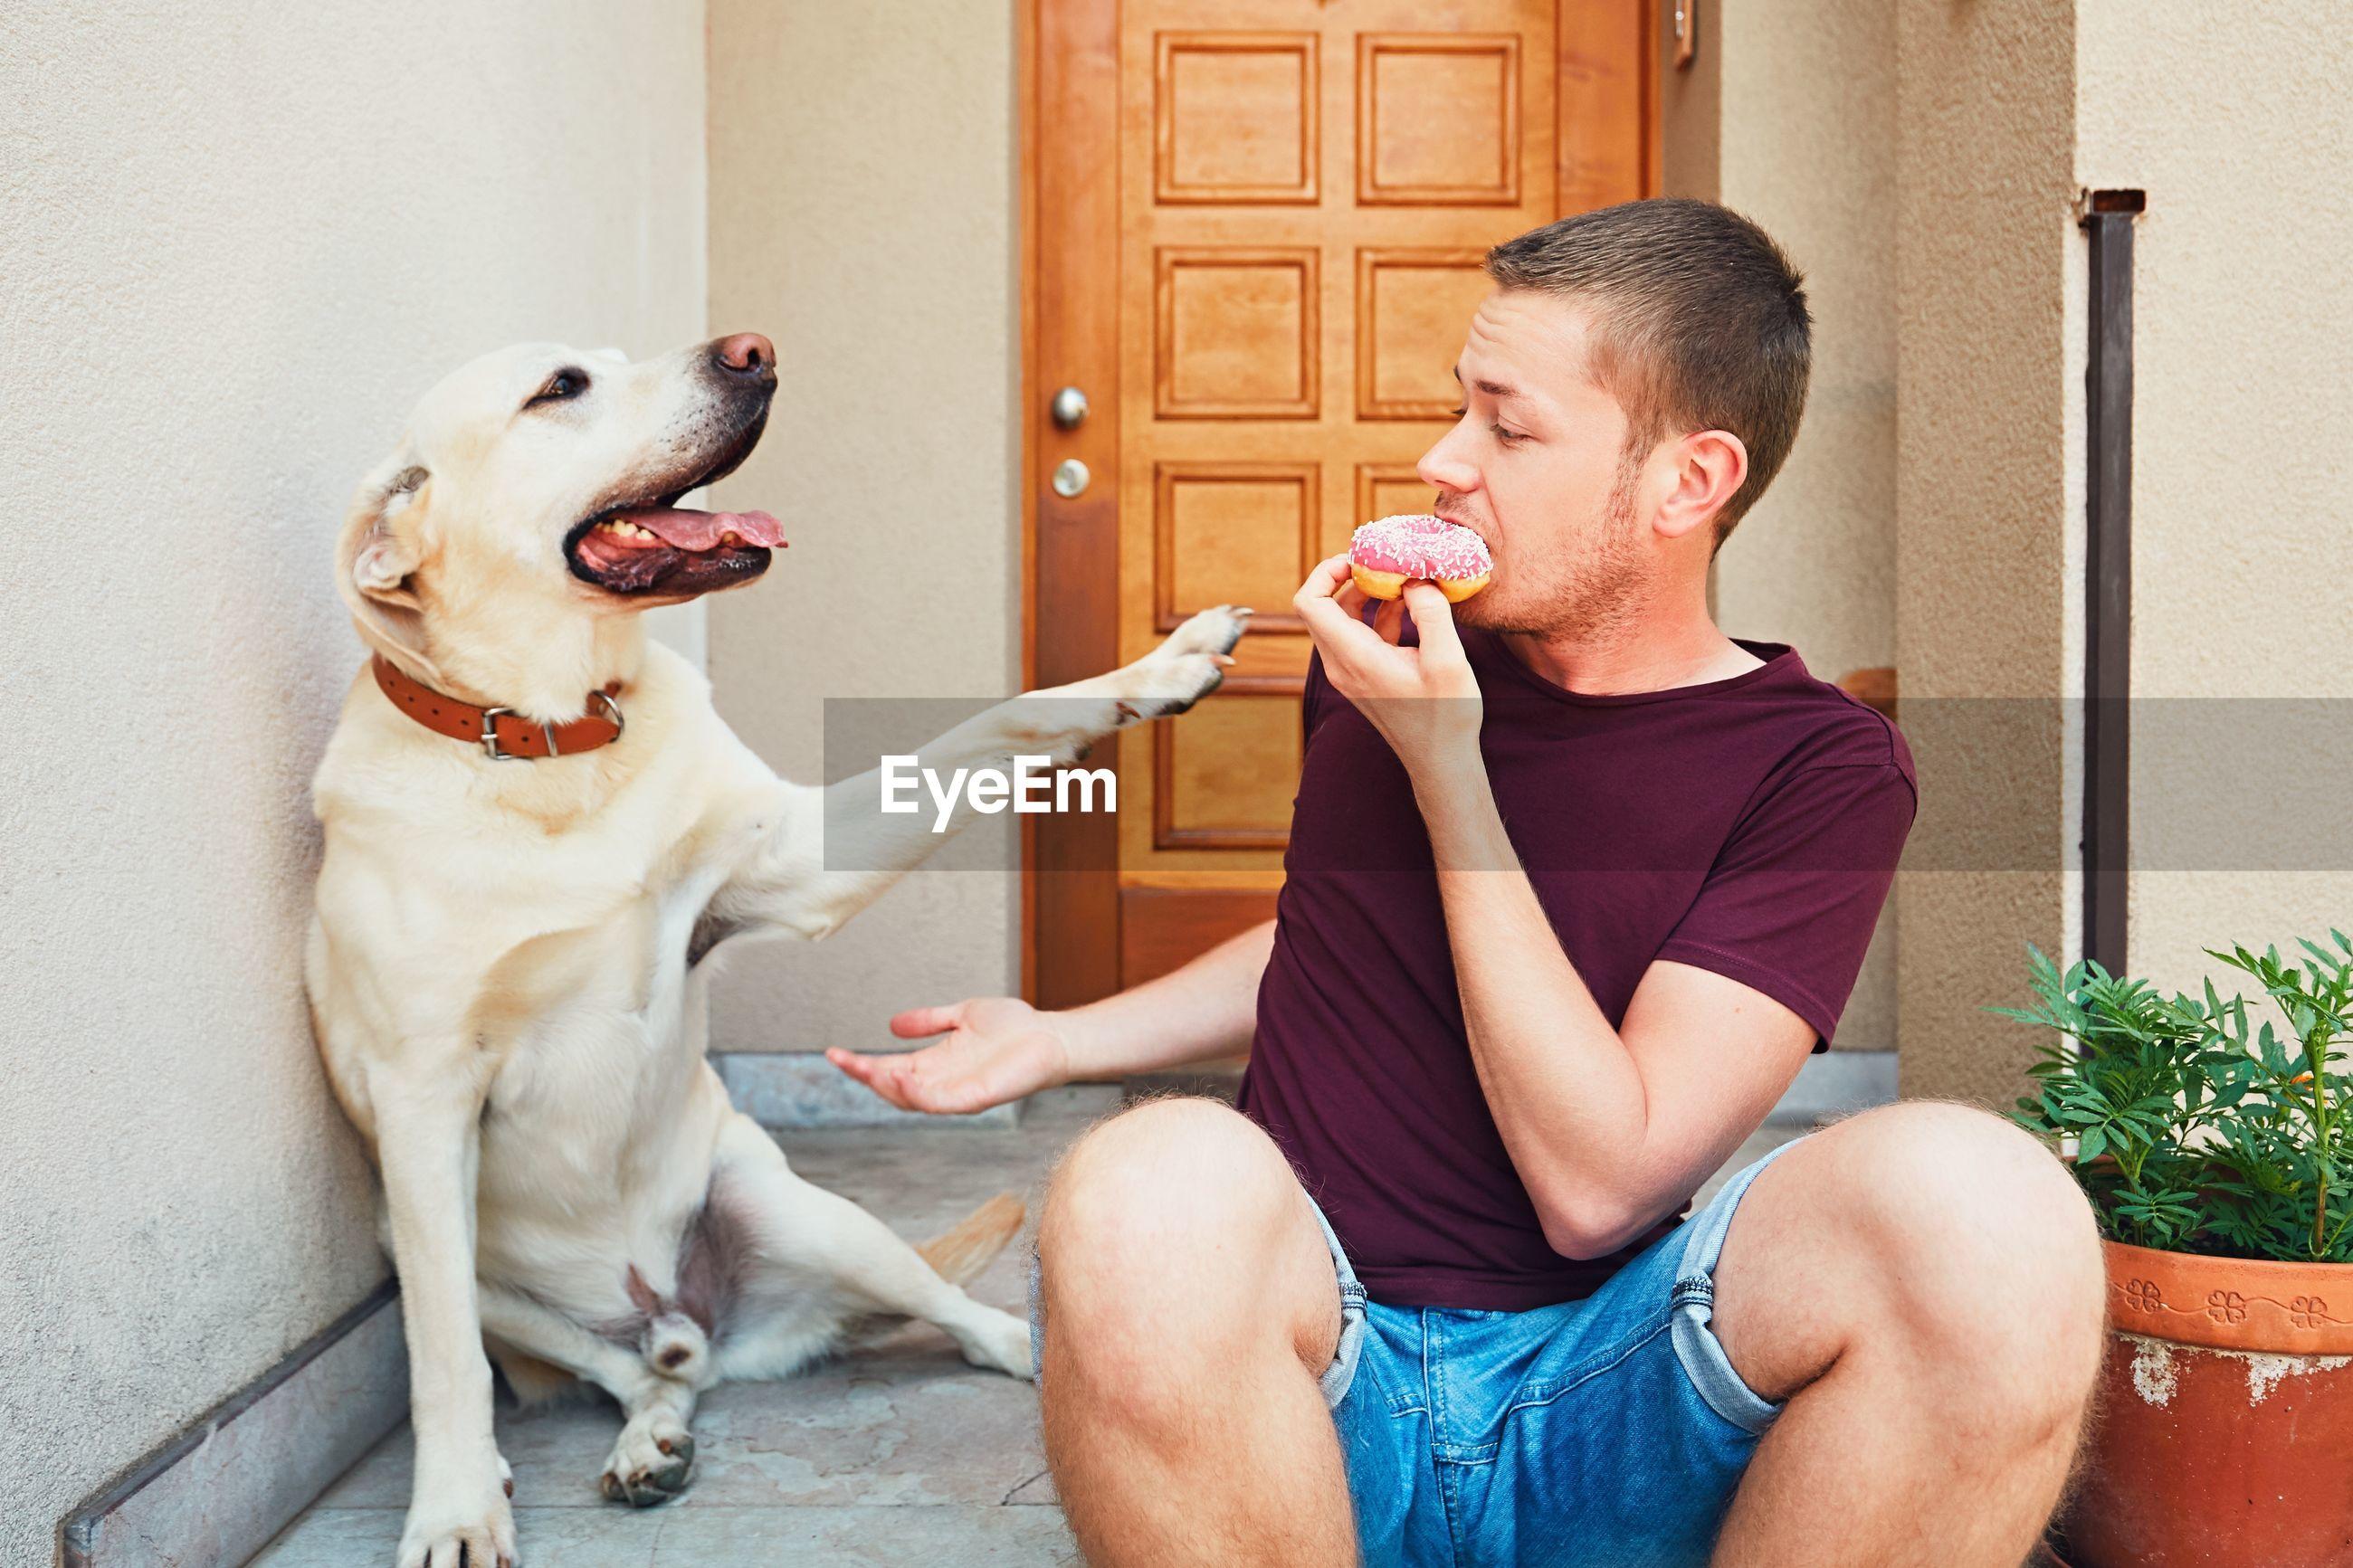 Labrador retriever reaching for man eating donut at entrance of house